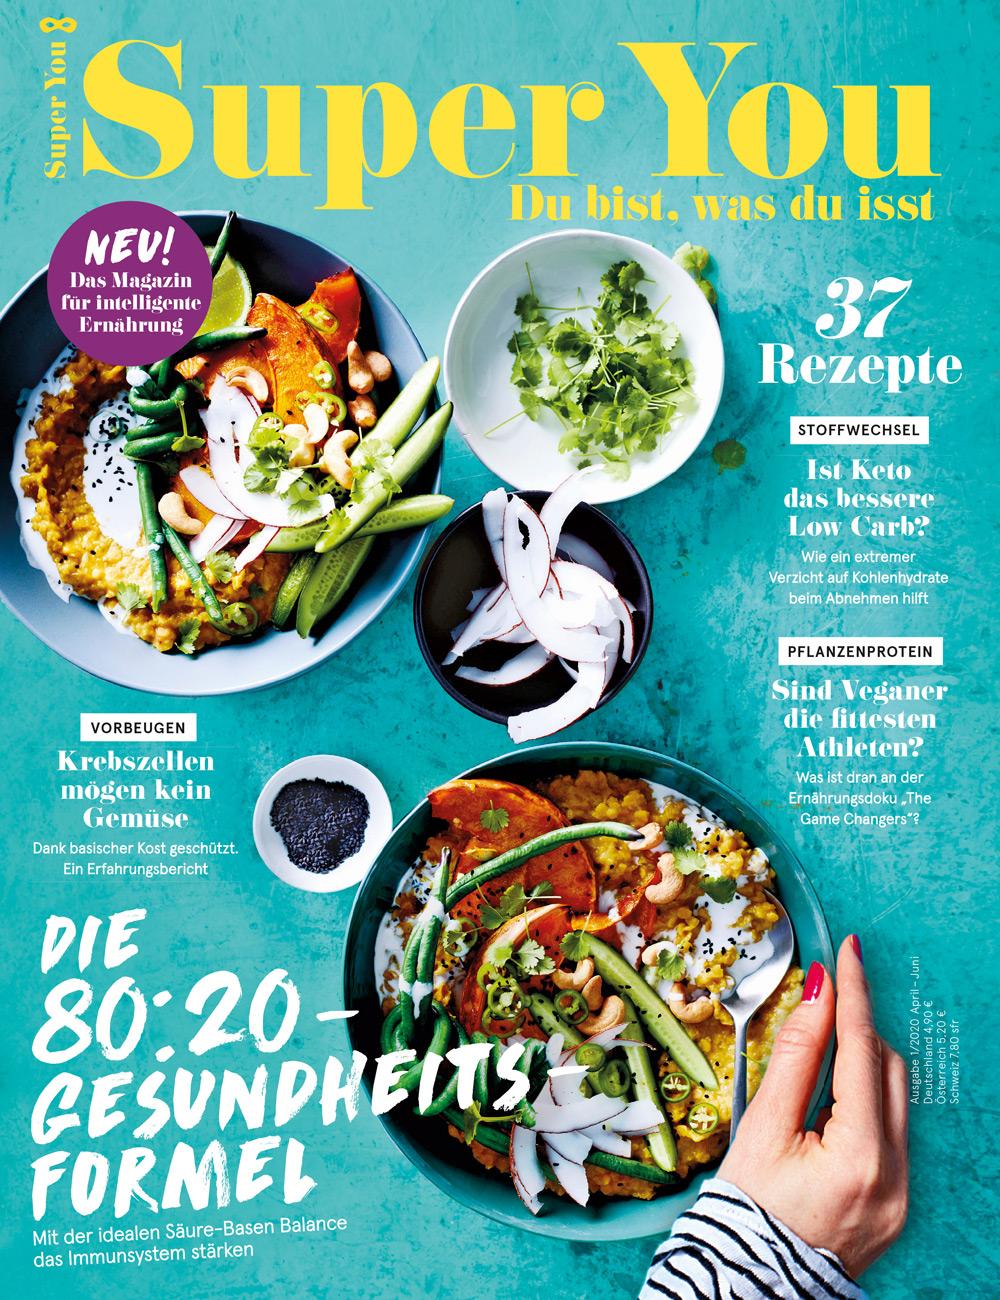 Super You Health-Style-Magazin Cover